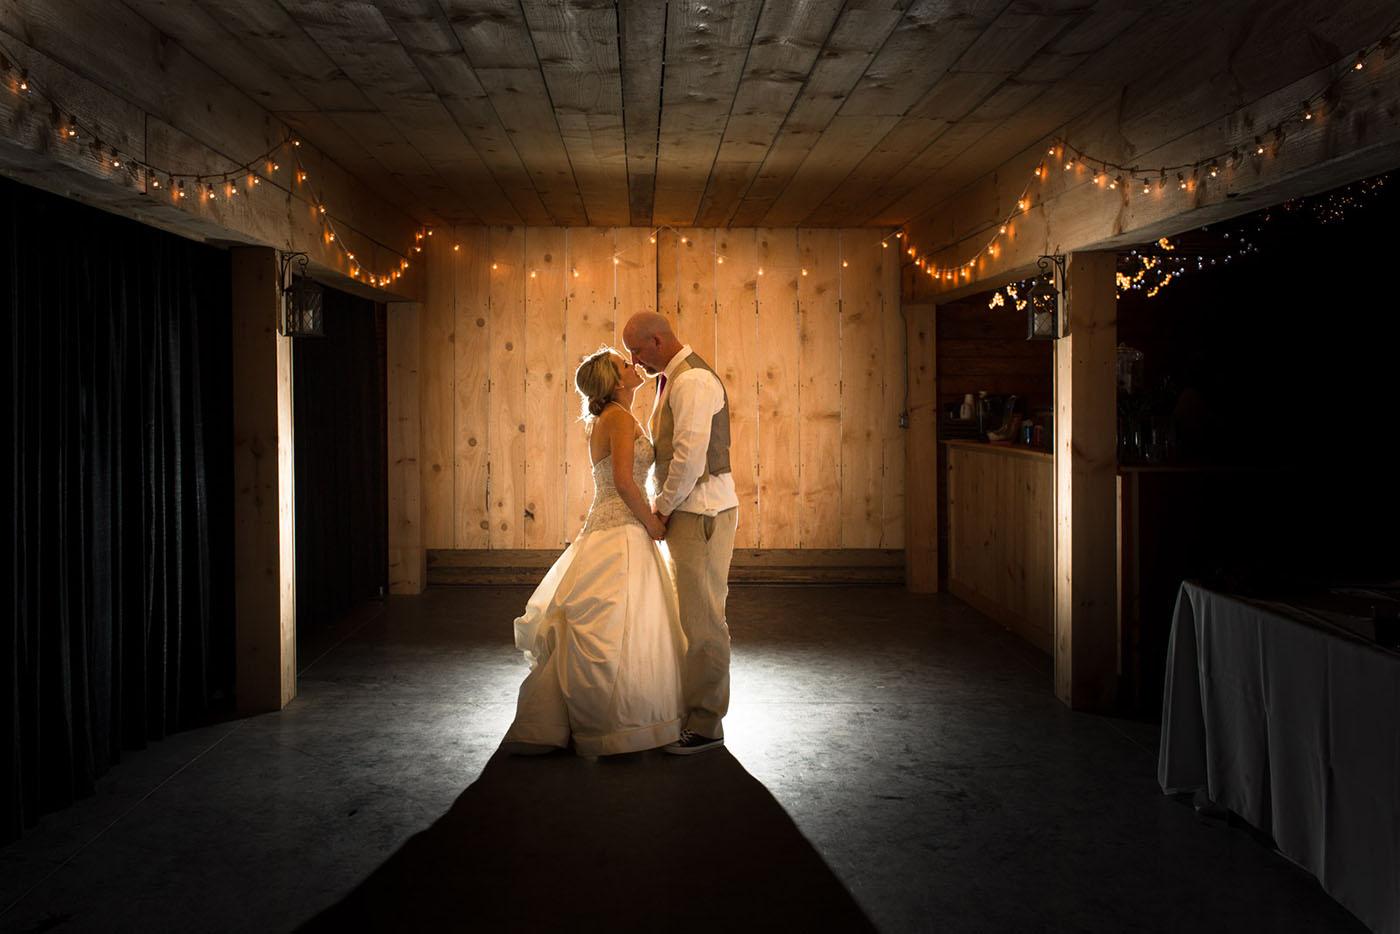 Sara-Jeremy-Wedding_5D3_0179B-Edit.jpg